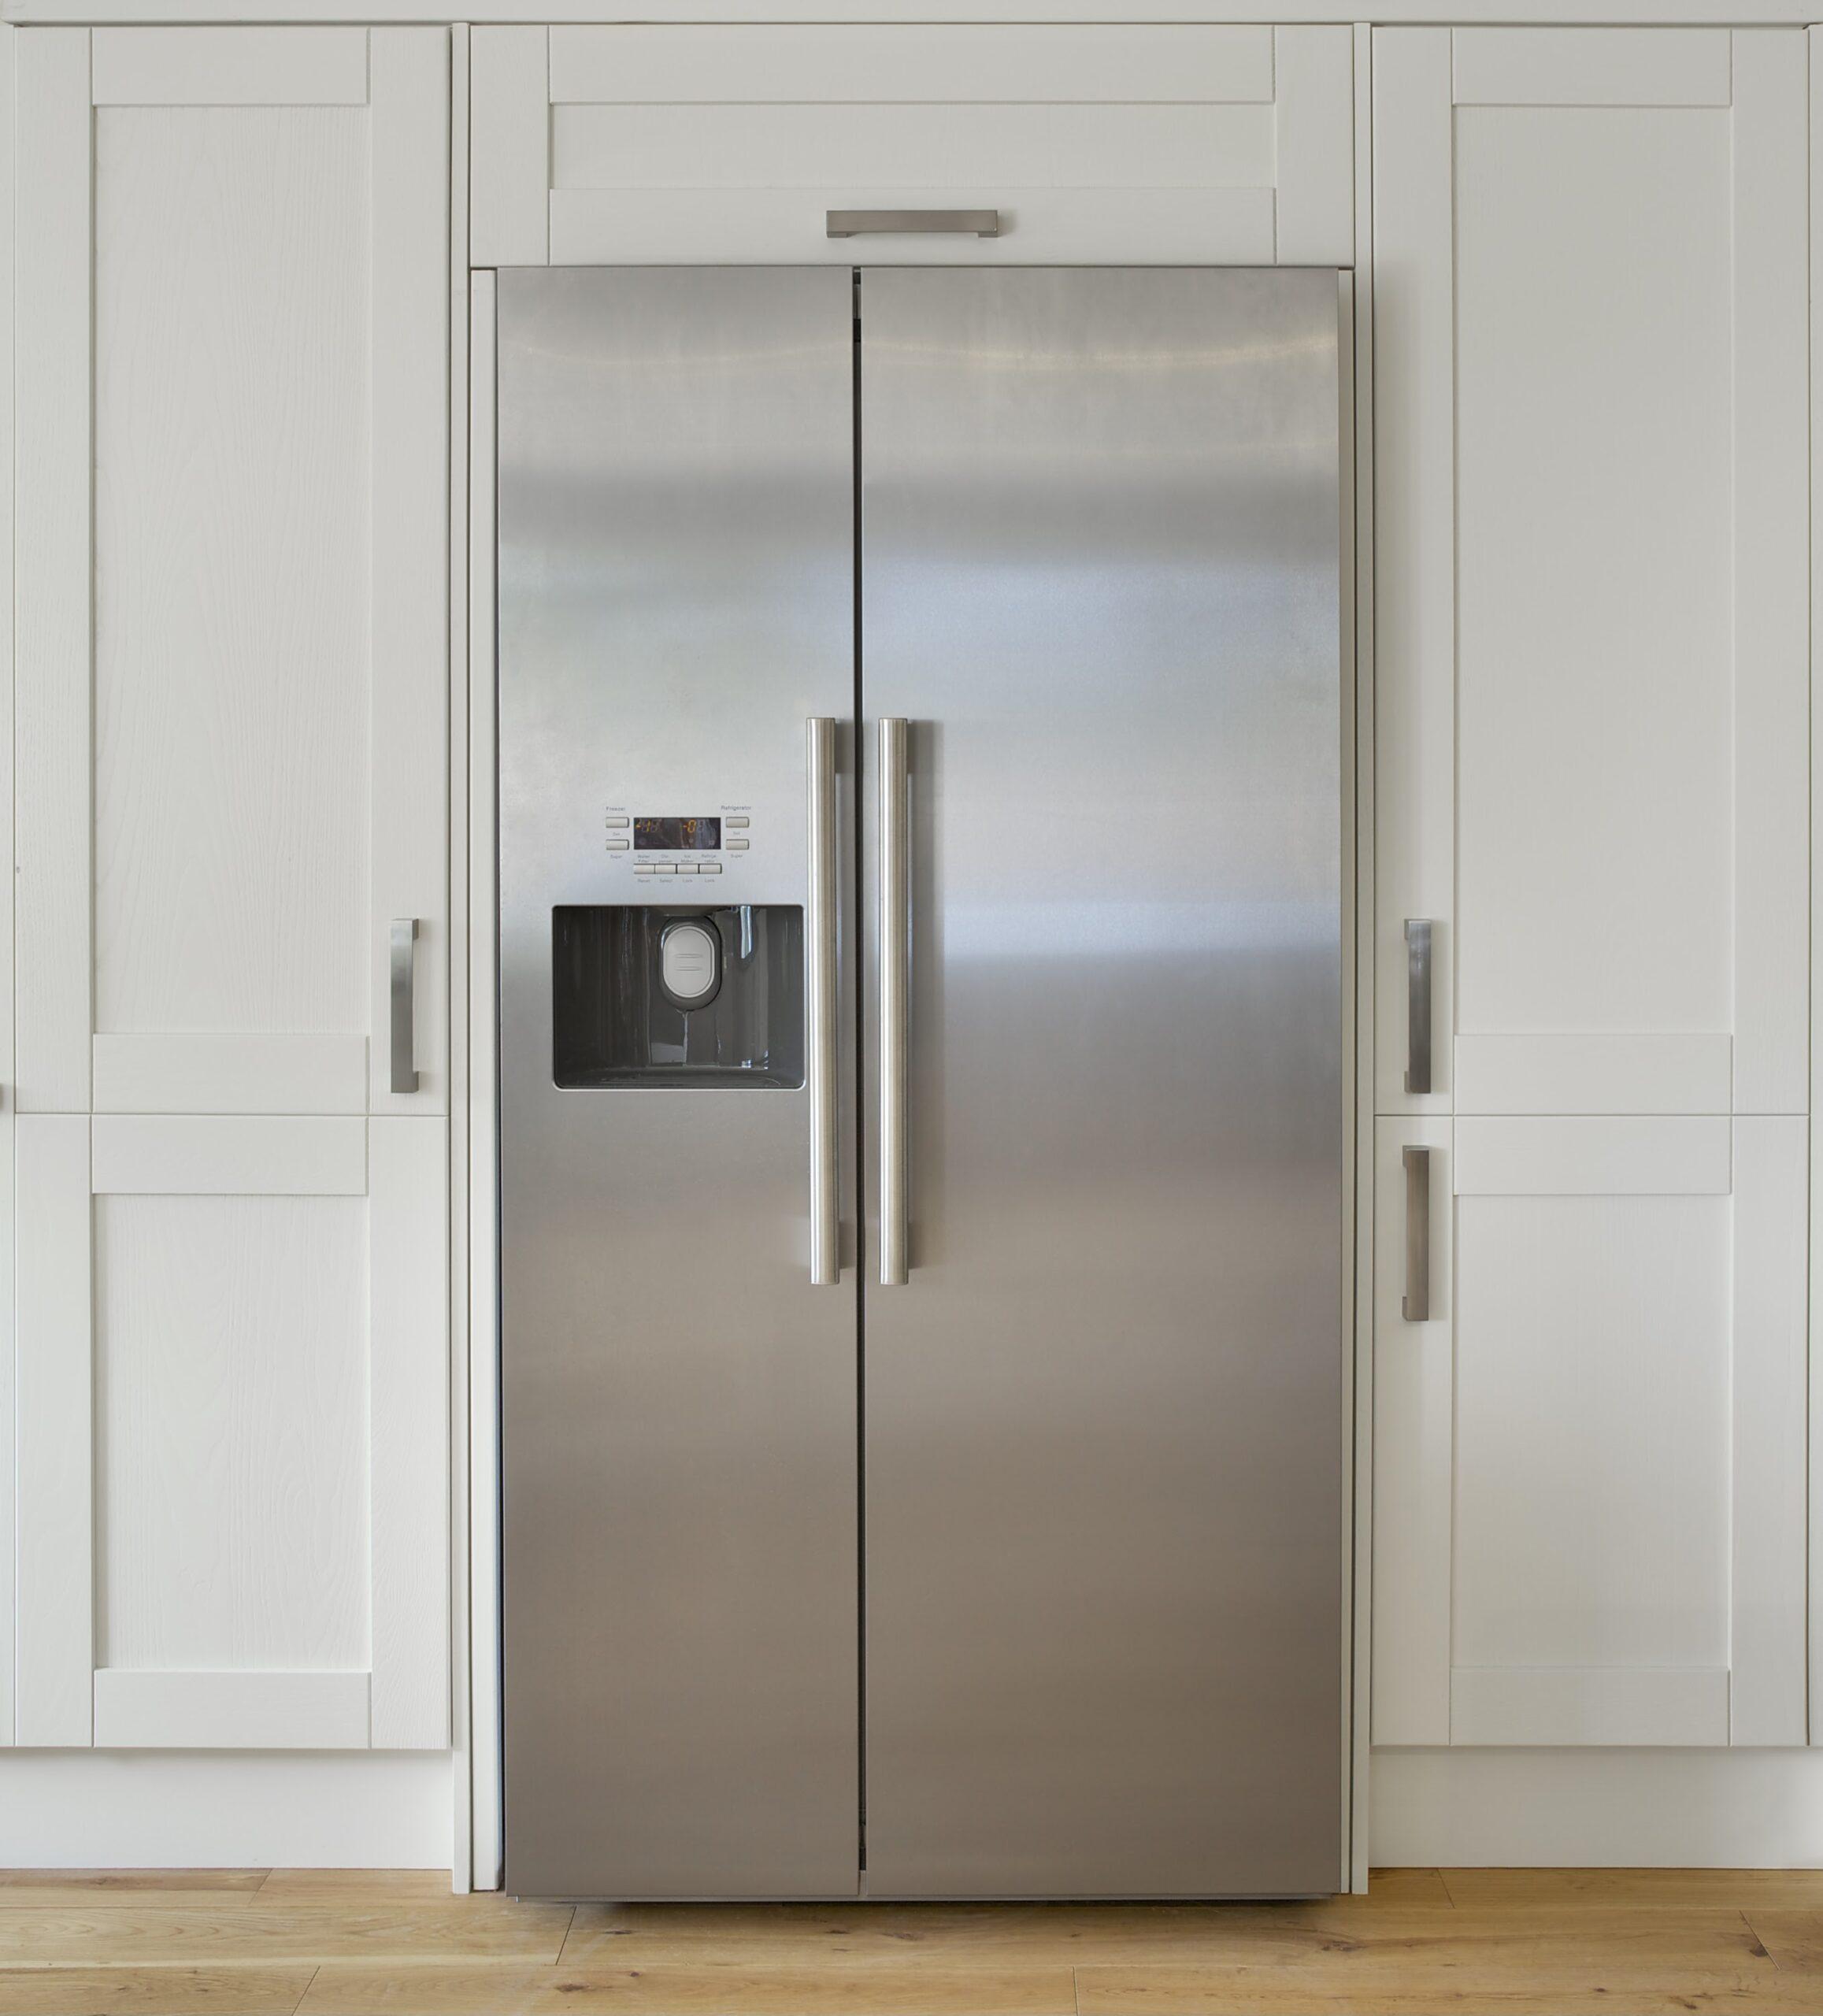 Refrigerator in Atkin, Minnesota